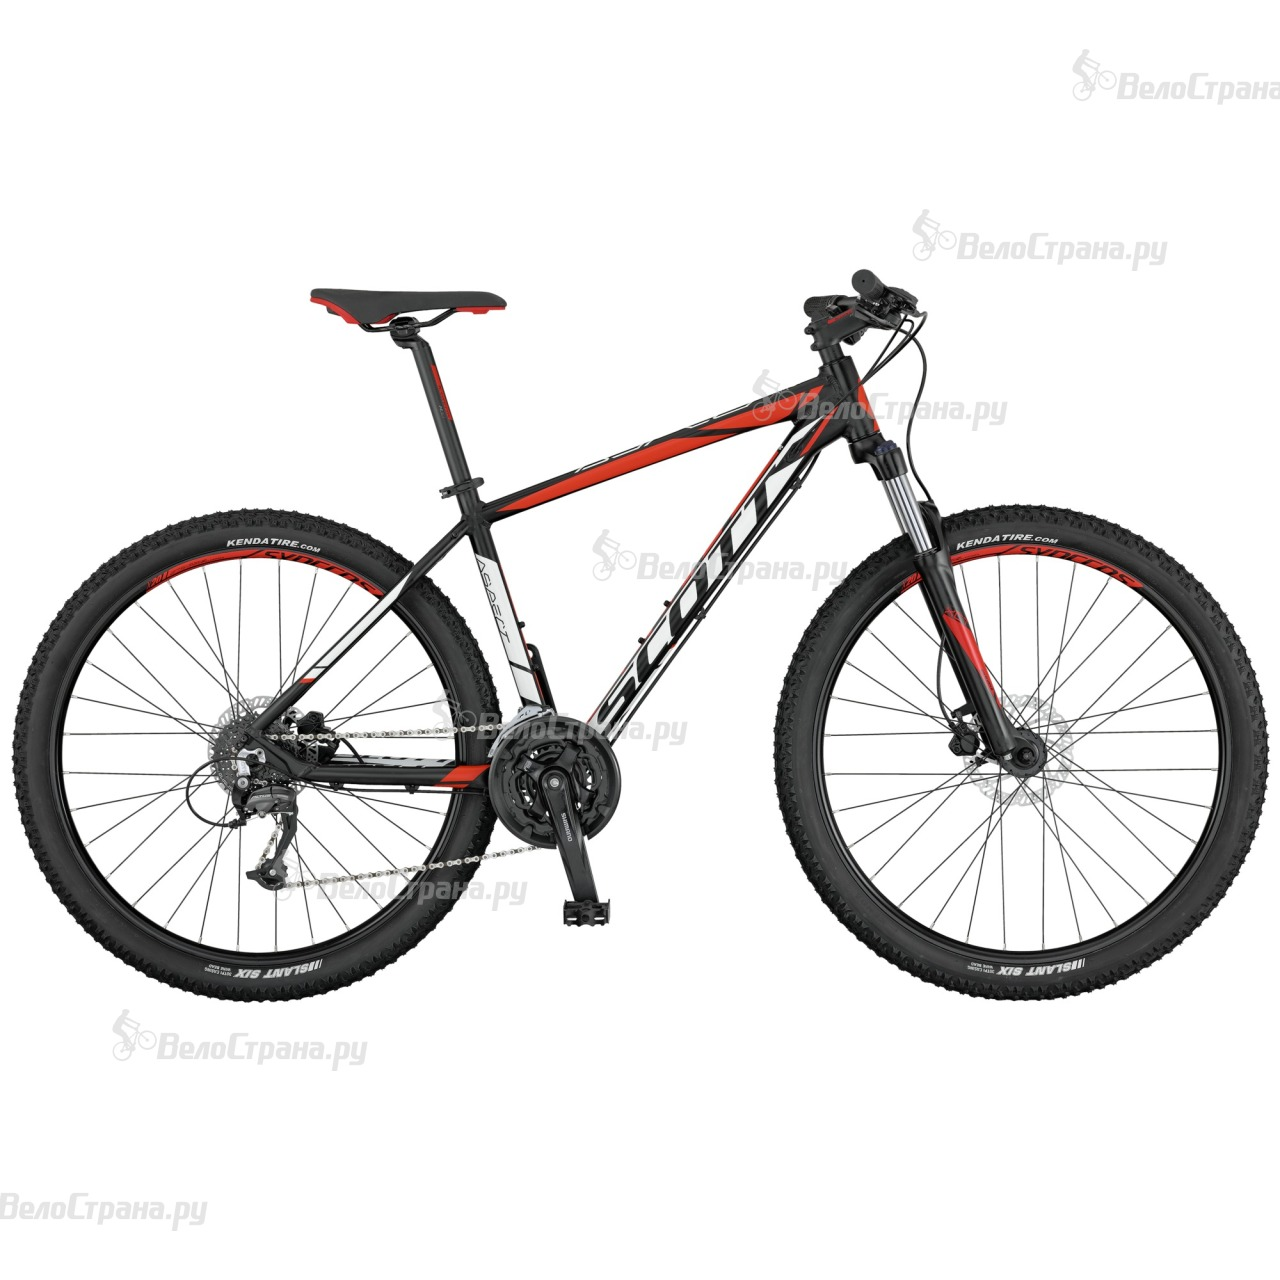 Велосипед Scott Aspect 950 (2017) велосипед scott aspect 950 29 2016